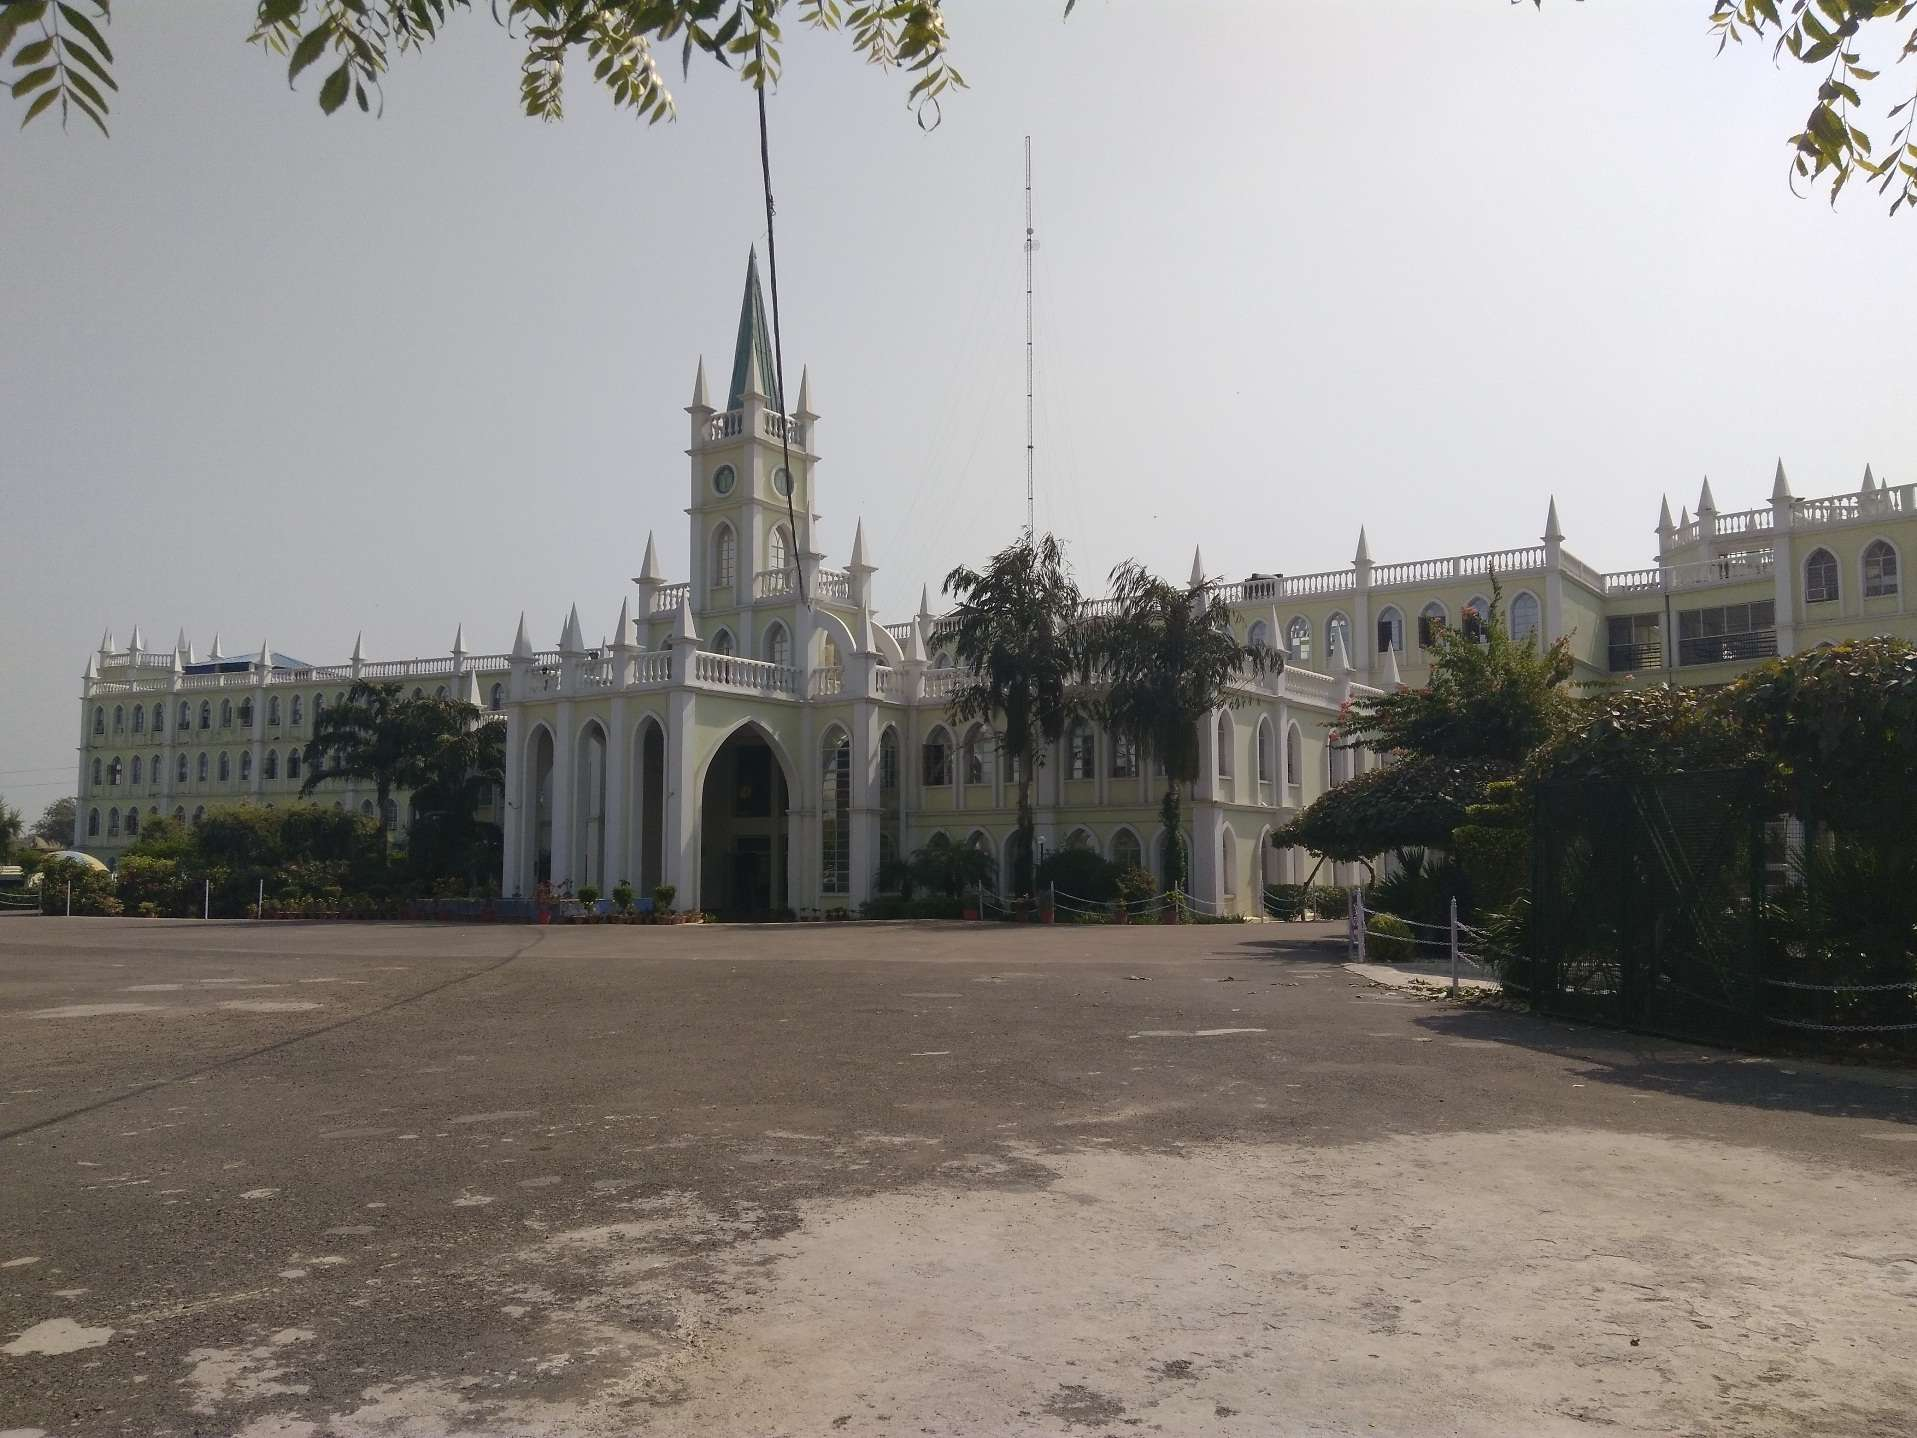 DELHI PUBLIC SCHOOL AZAD NAGAR MAINAWATI MARG KANPUR UP 2130724